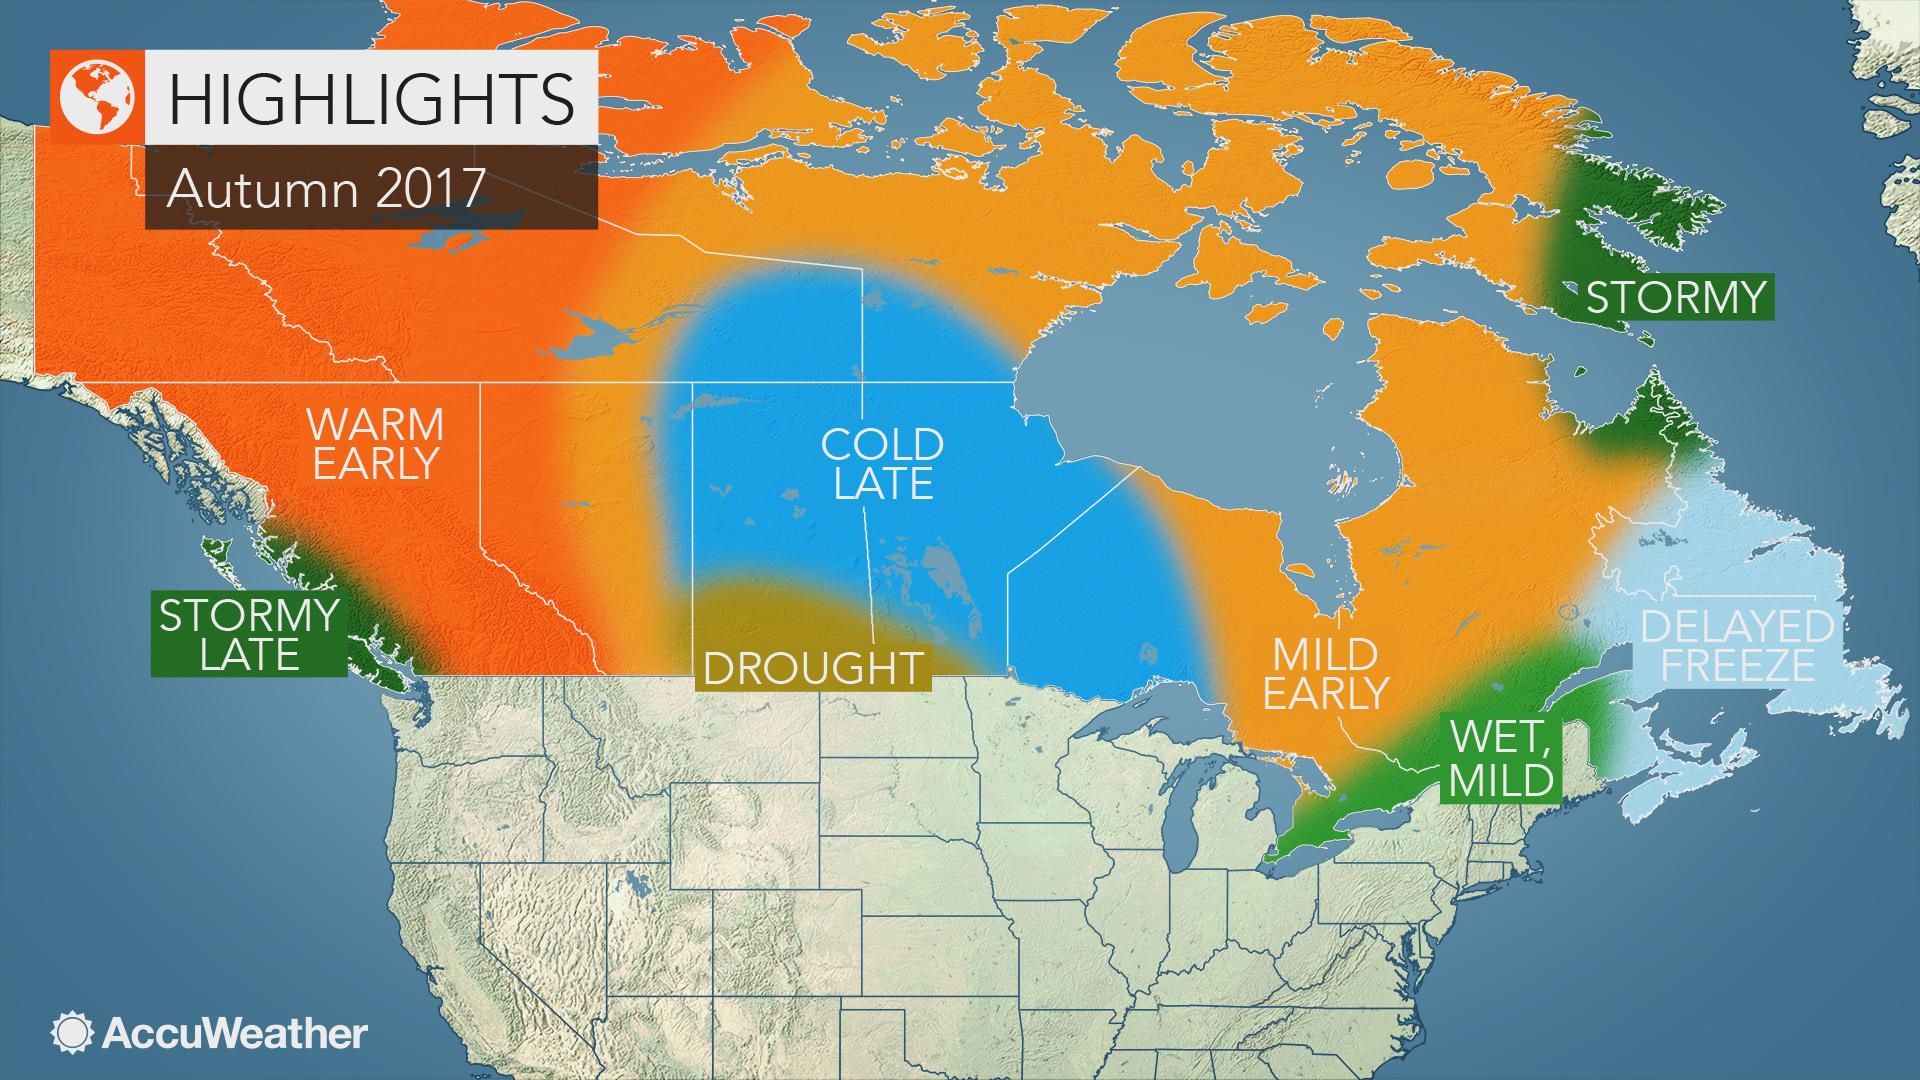 Canada Fall Foliage Map 2017 Canada fall forecast: Mild autumn to unfold in eastern